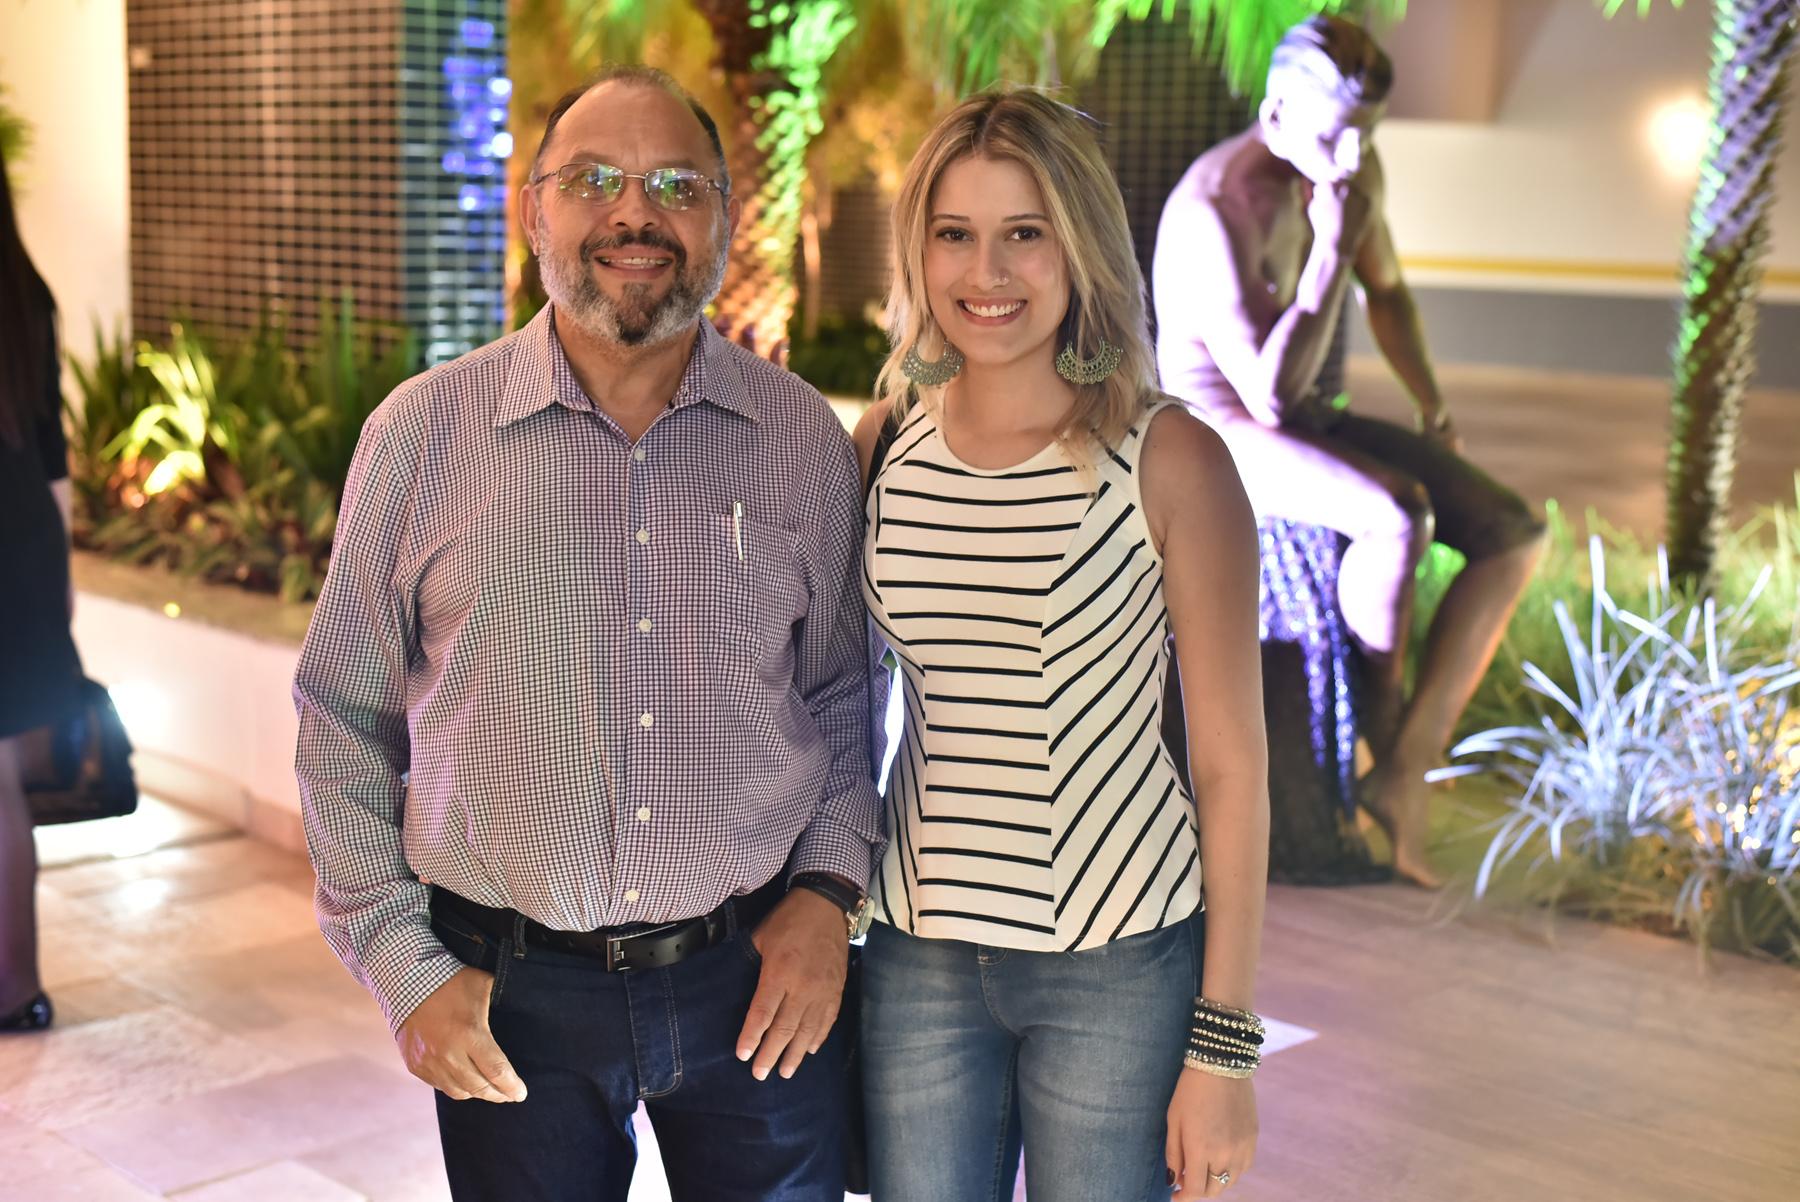 Antonio Carlos da Silva fotografado ao lado da filha Julia Mattos.